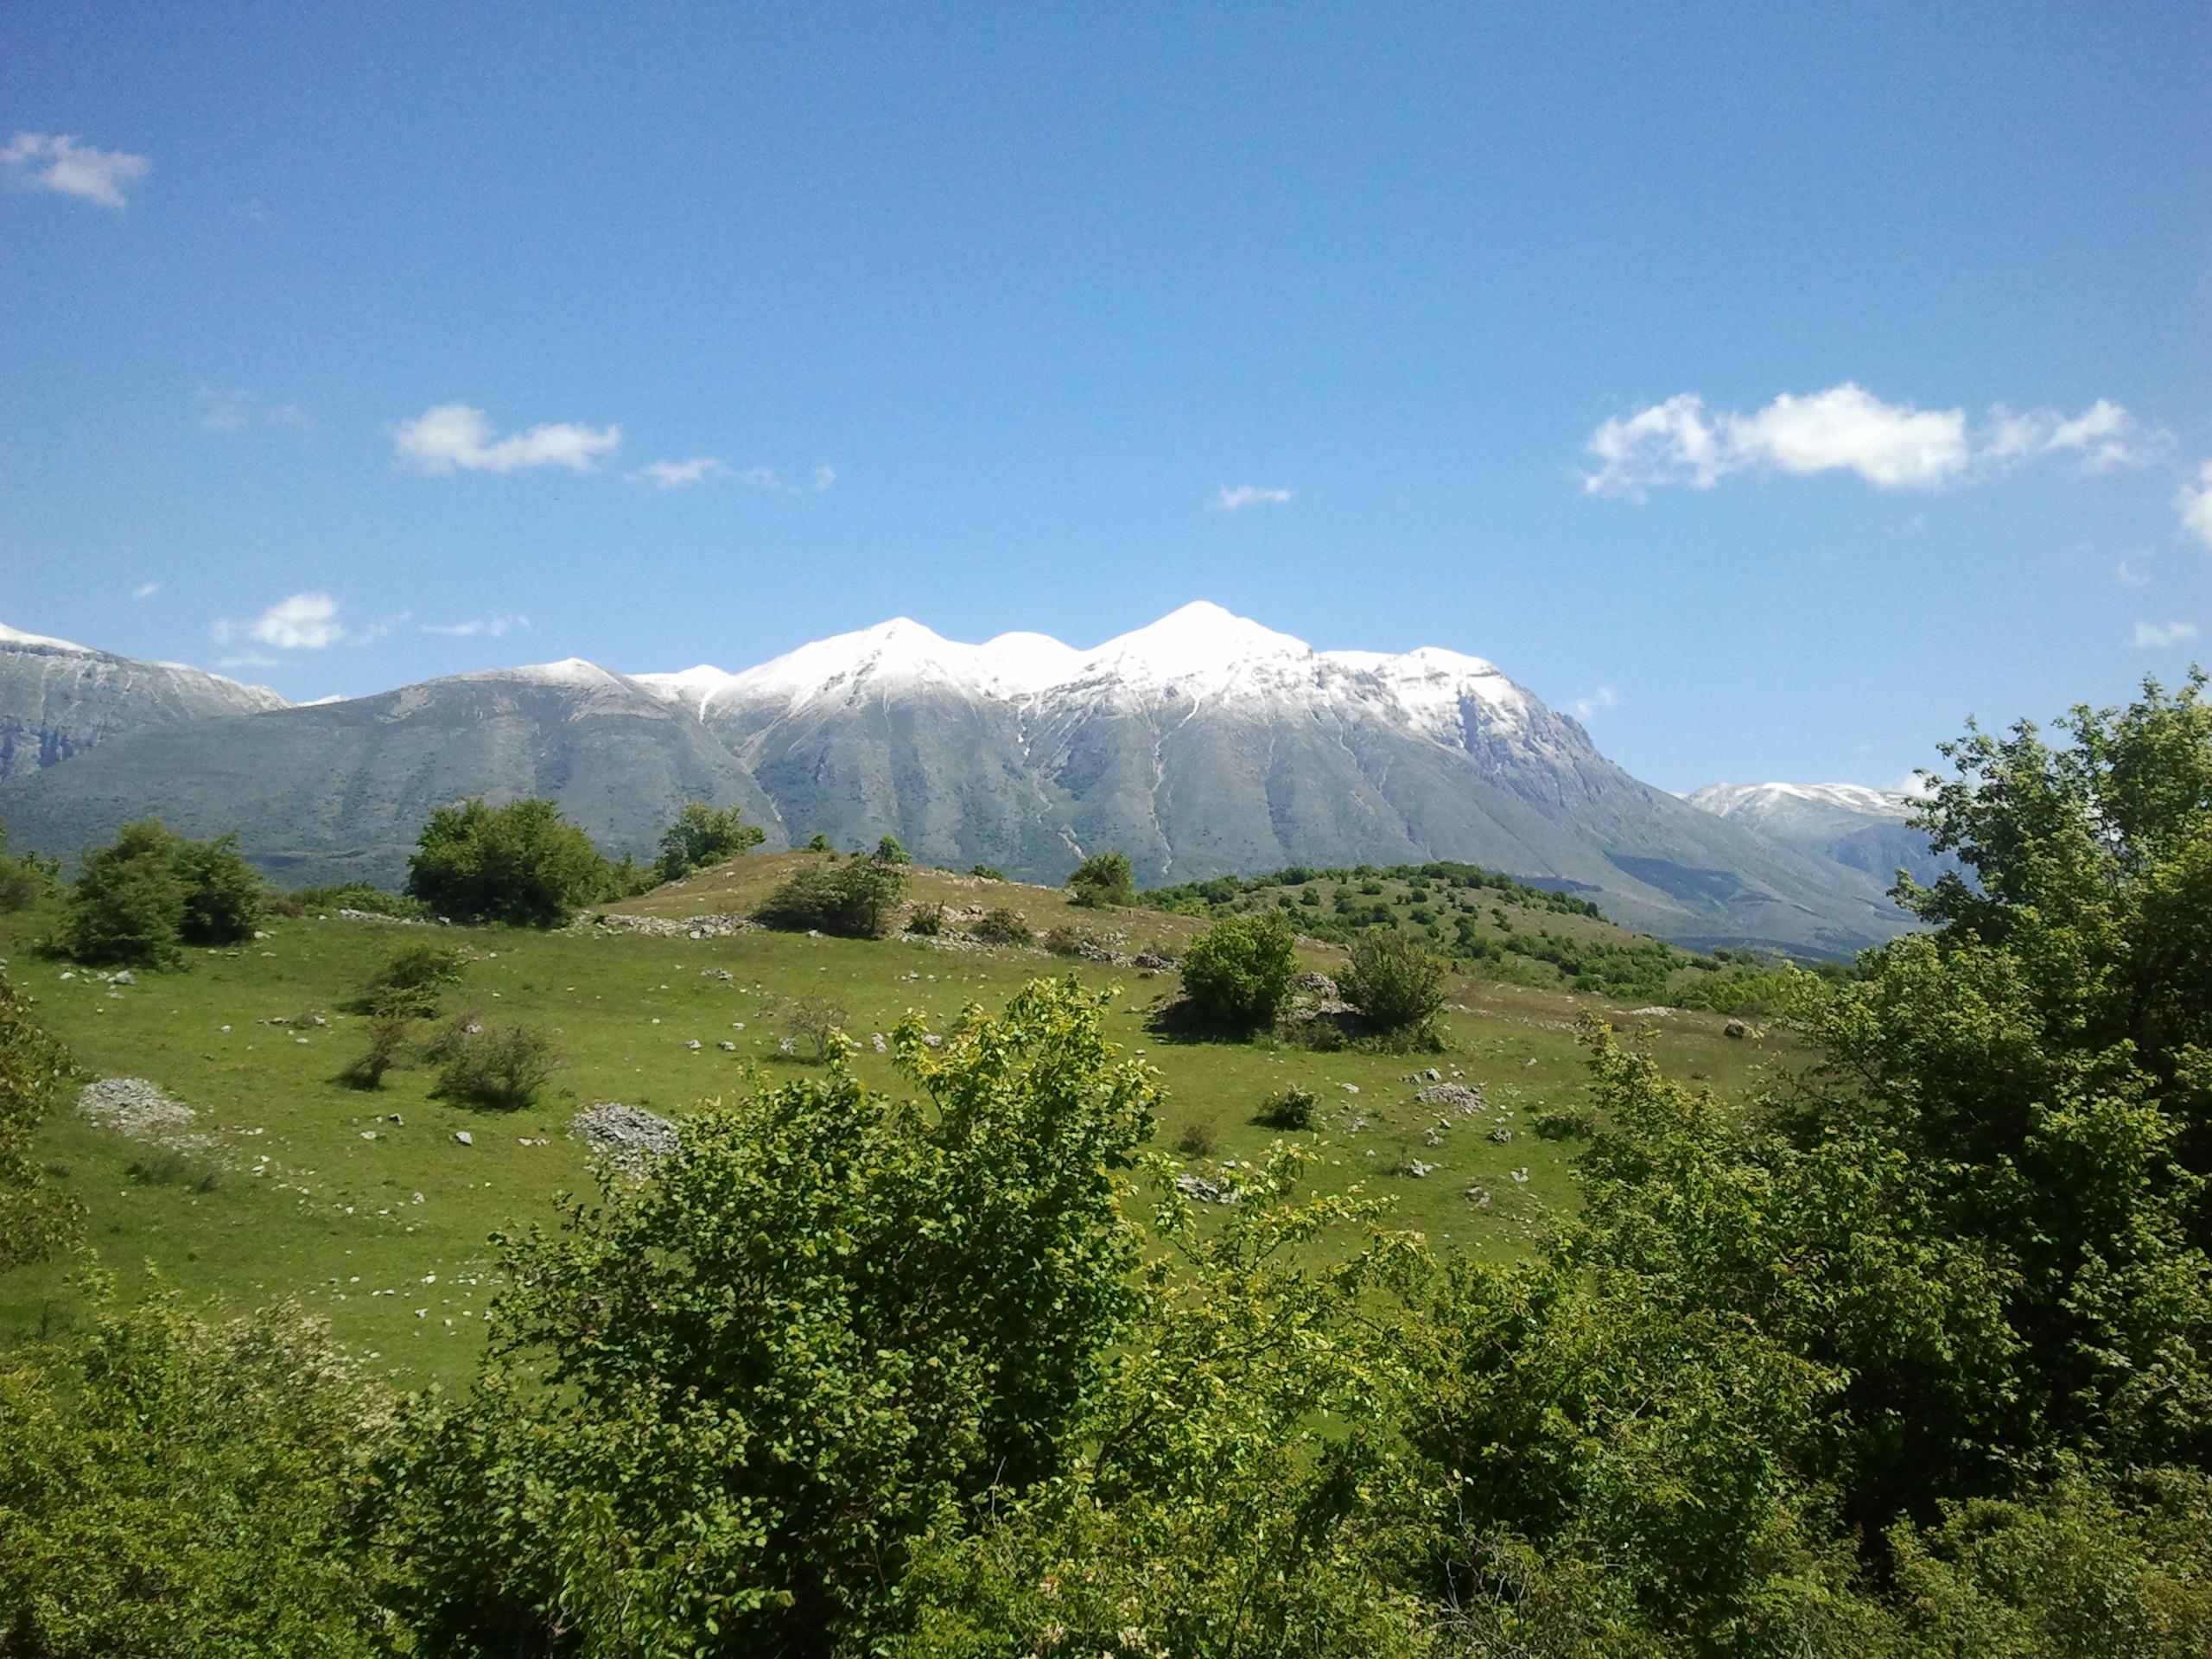 Veduta del Monte Velino